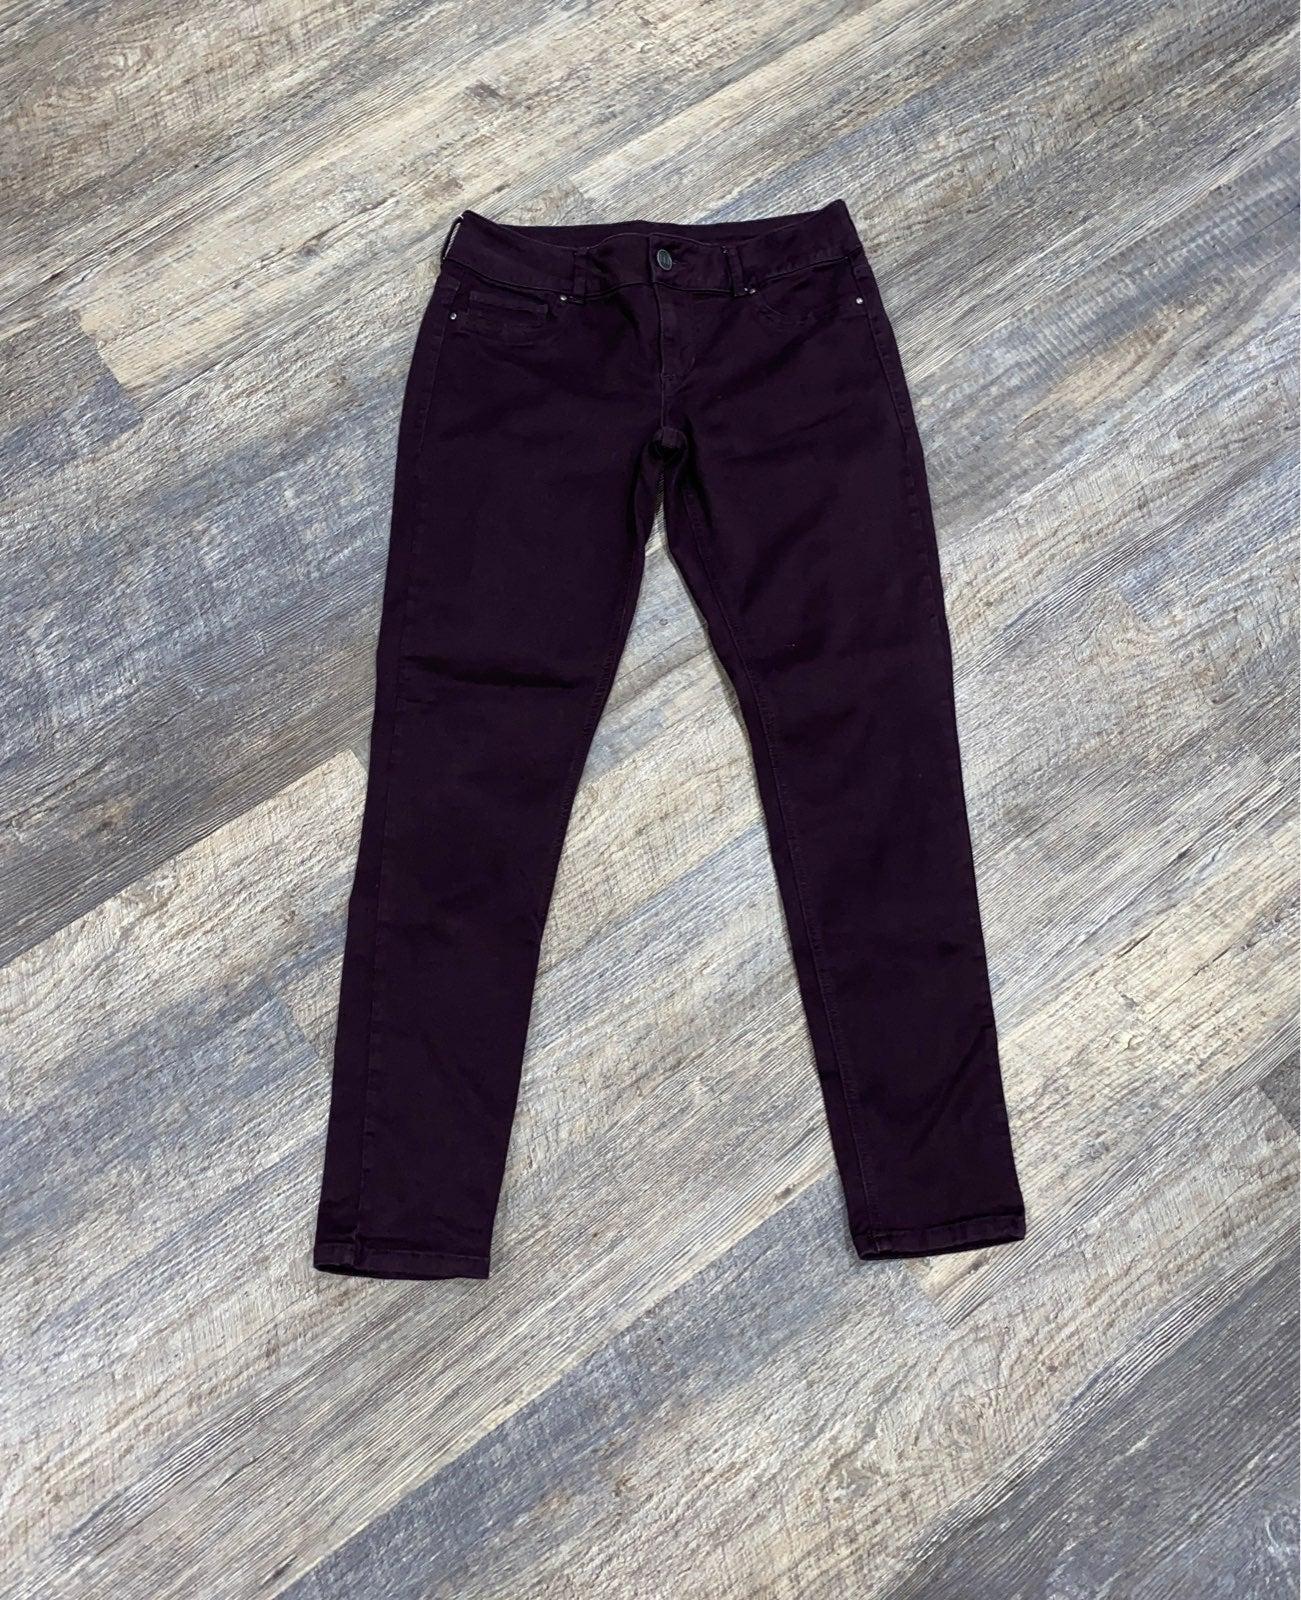 Womens skinny jeans / jeggings